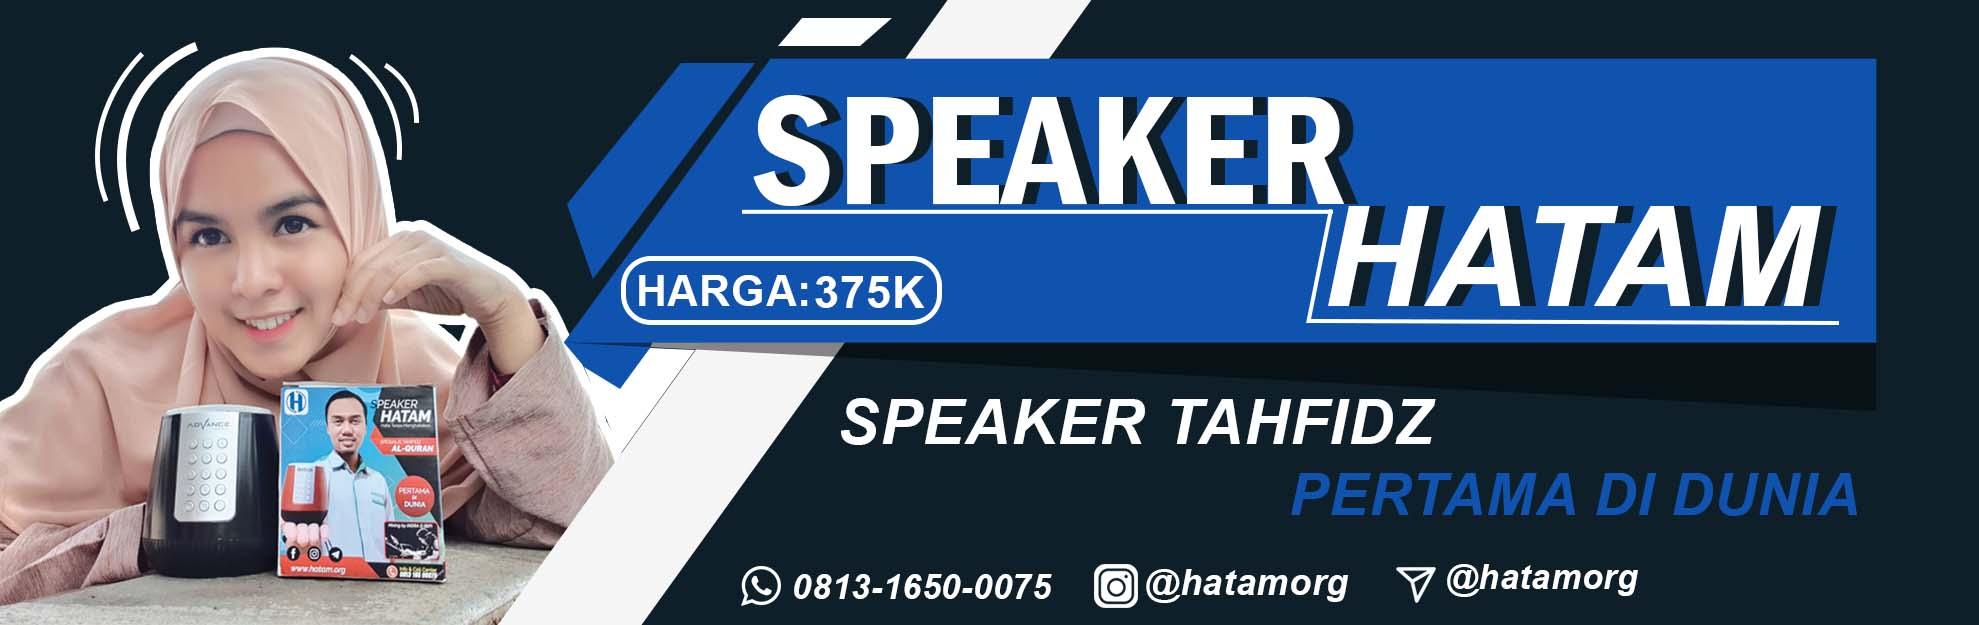 speaker spesialis tahfidz hatam